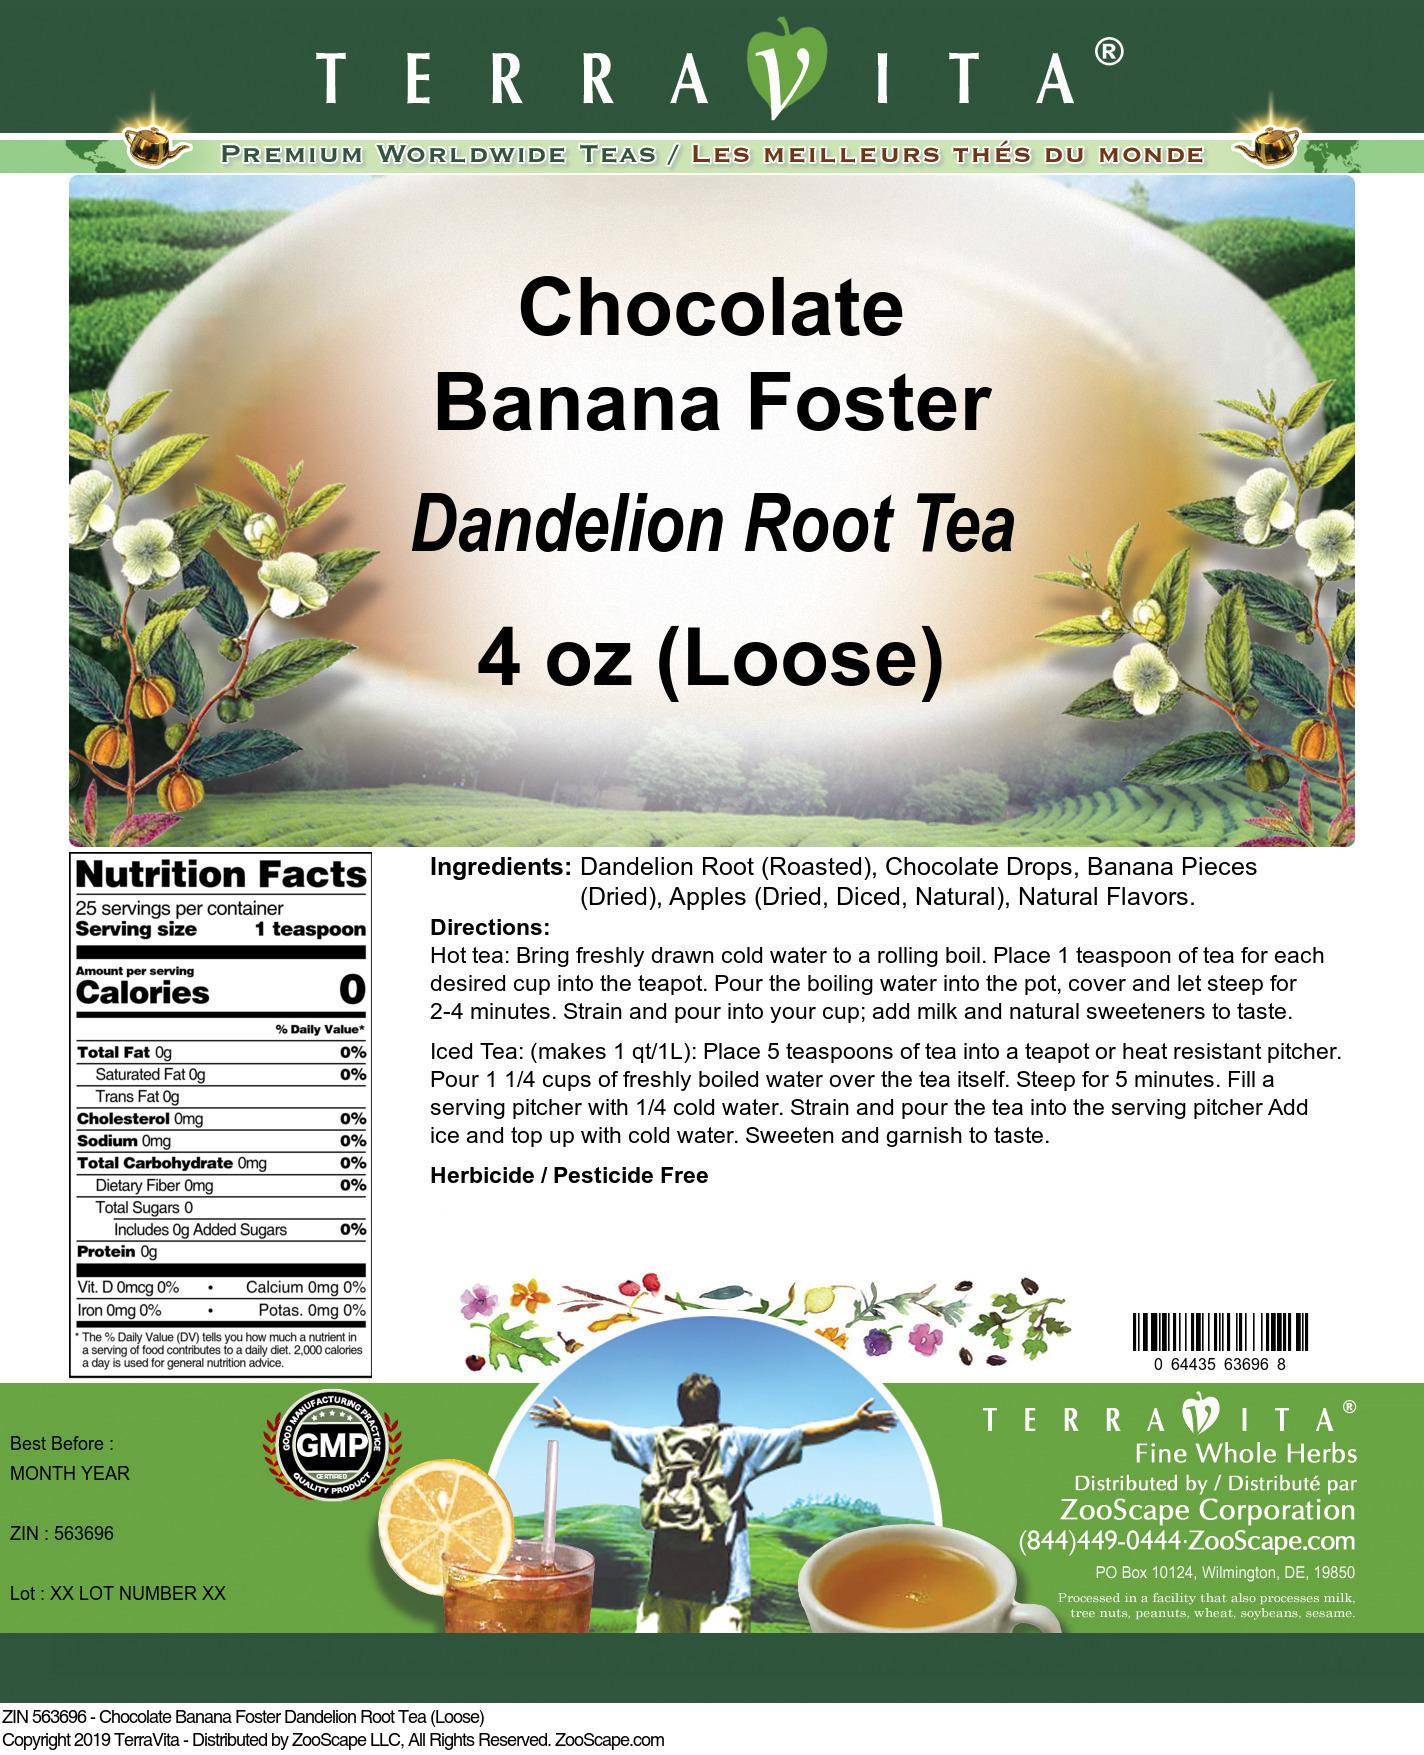 Chocolate Banana Foster Dandelion Root